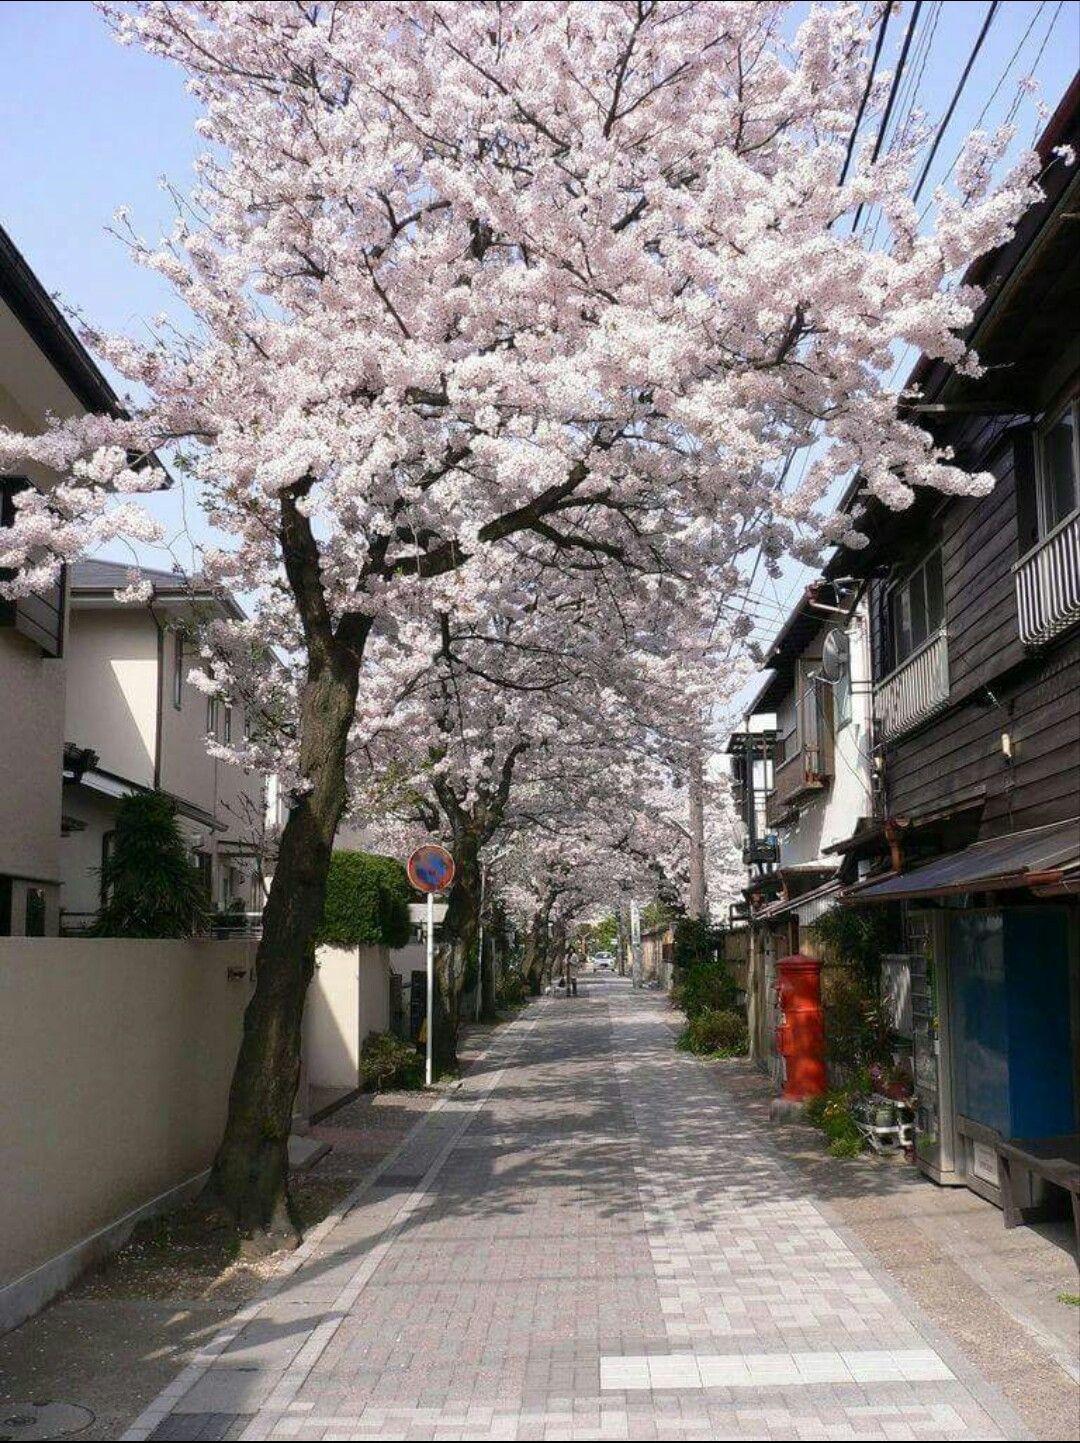 Cherry Blossom Aesthetic Japan